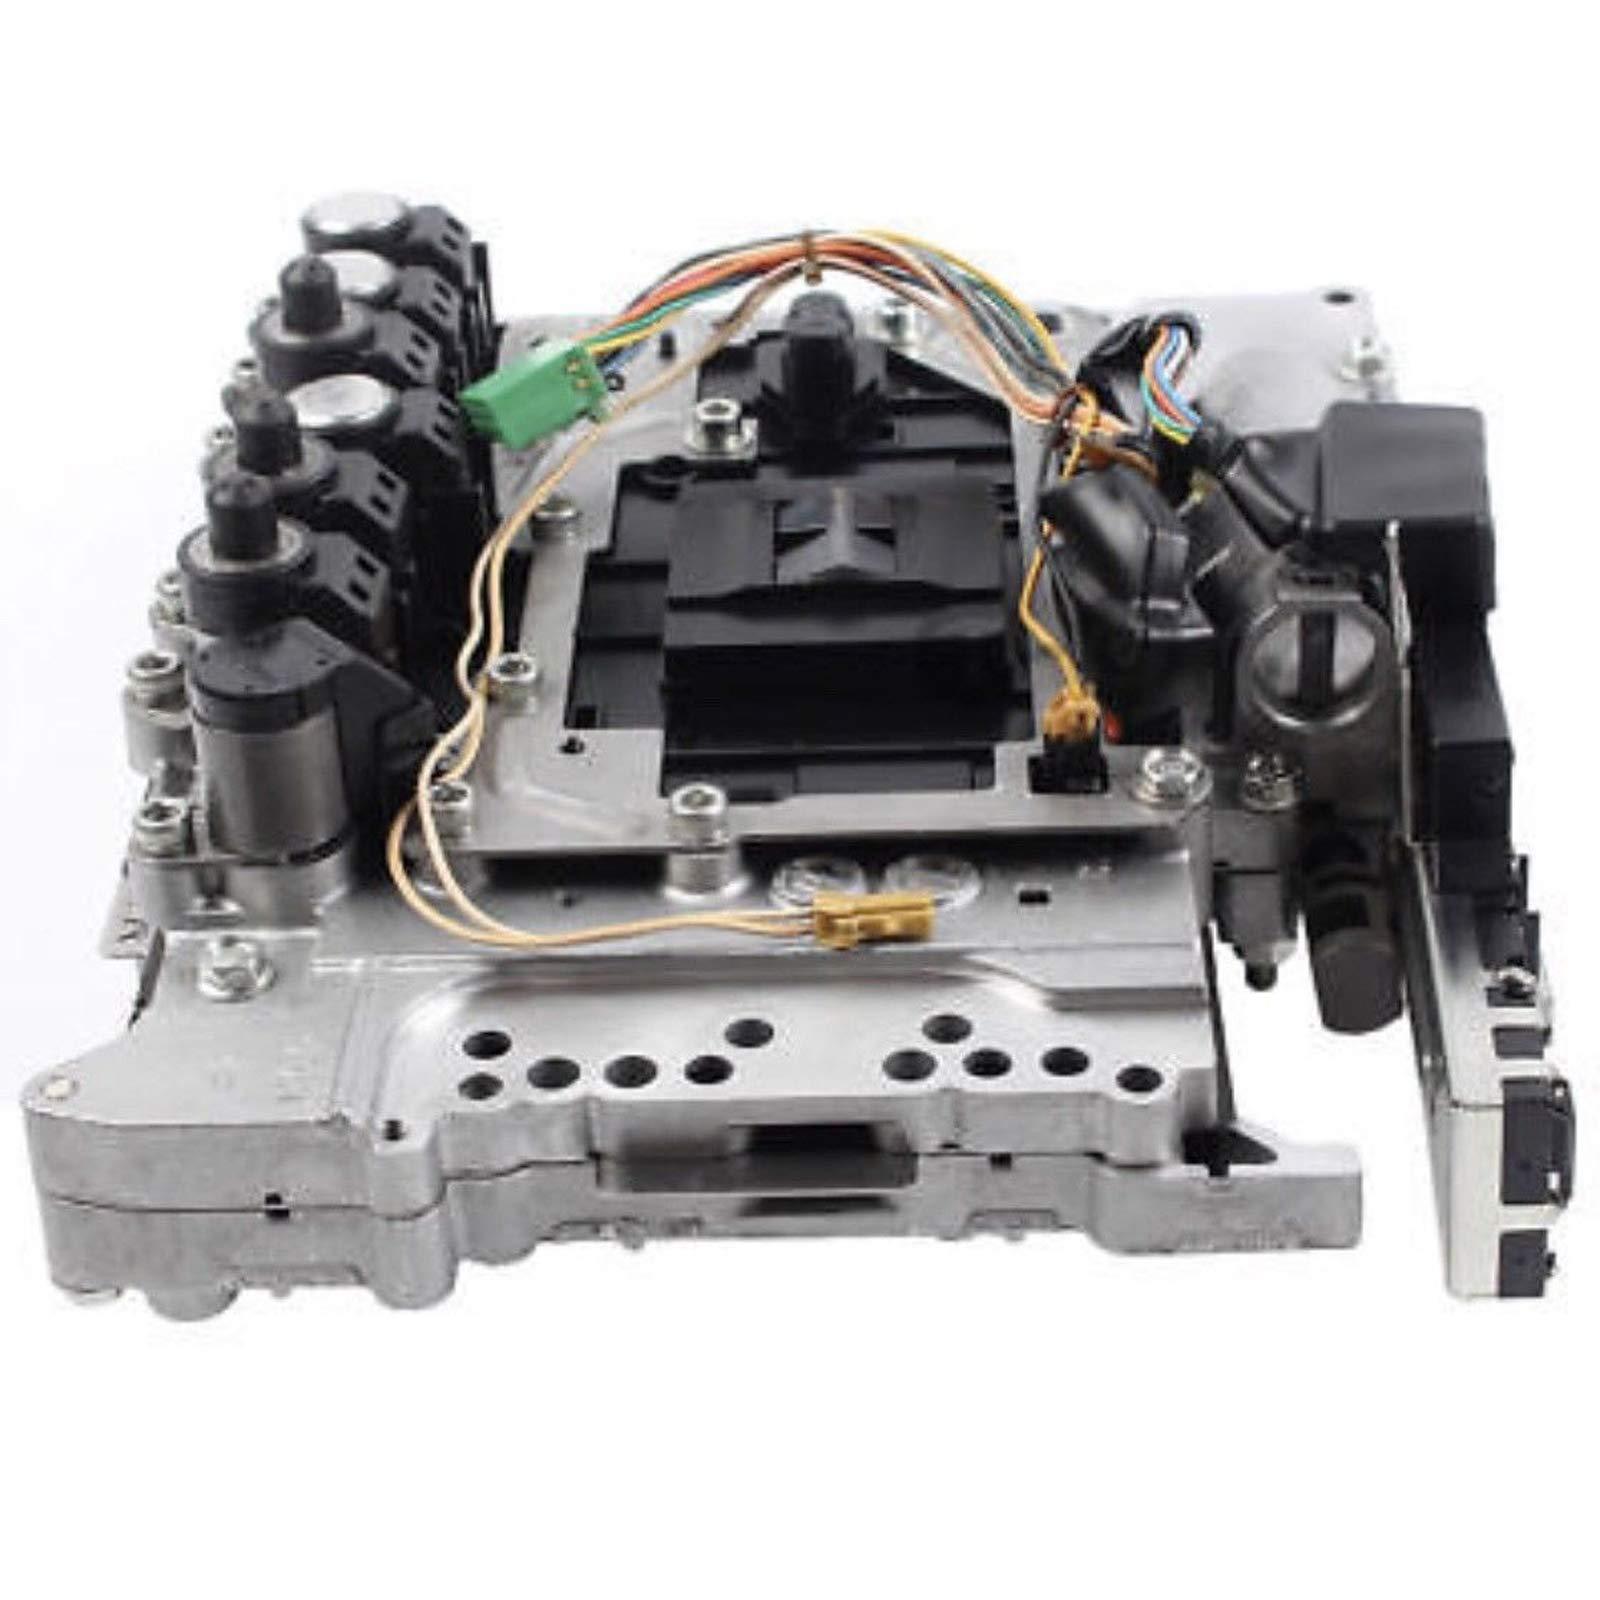 Friday Part RE5R05A Valve Body for Nissan Xterra Pathfinder Armada Frontier Titan